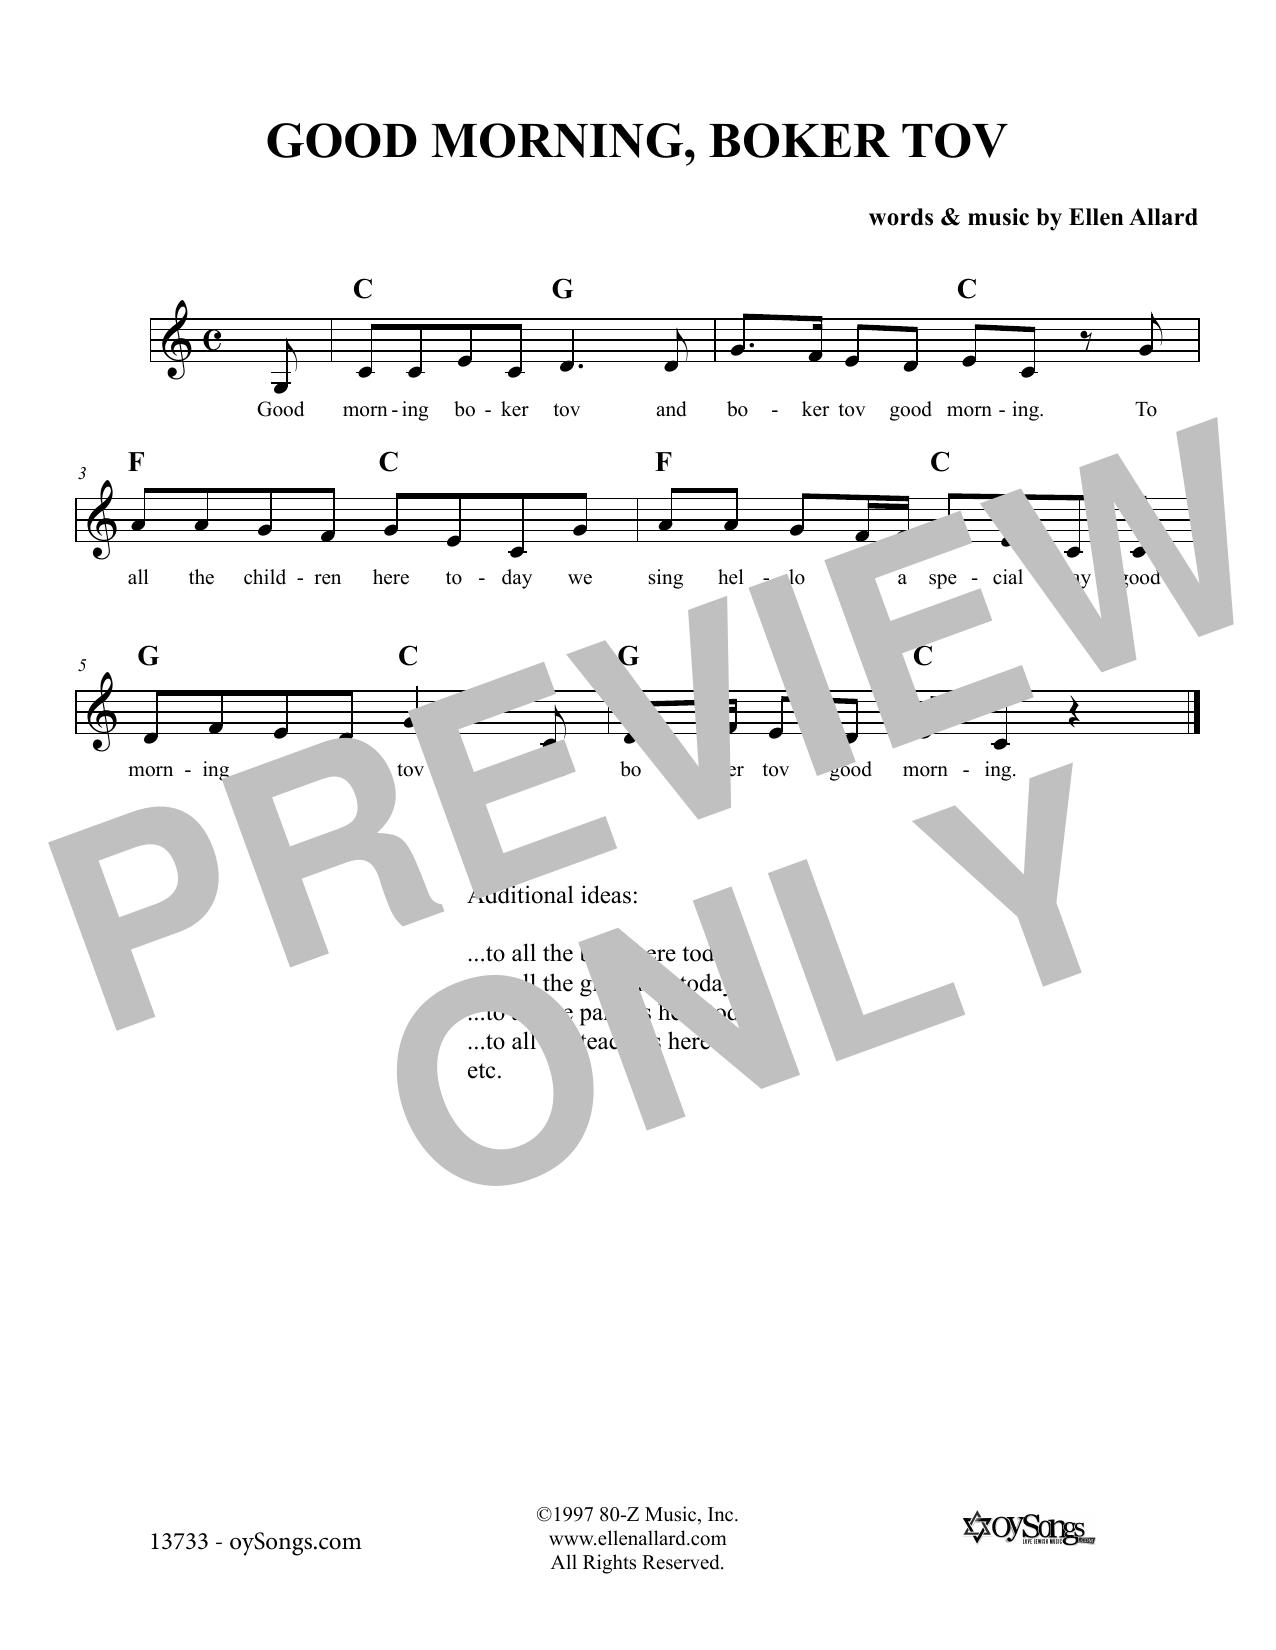 Ellen Allard Good Morning Boker Tov sheet music notes and chords. Download Printable PDF.